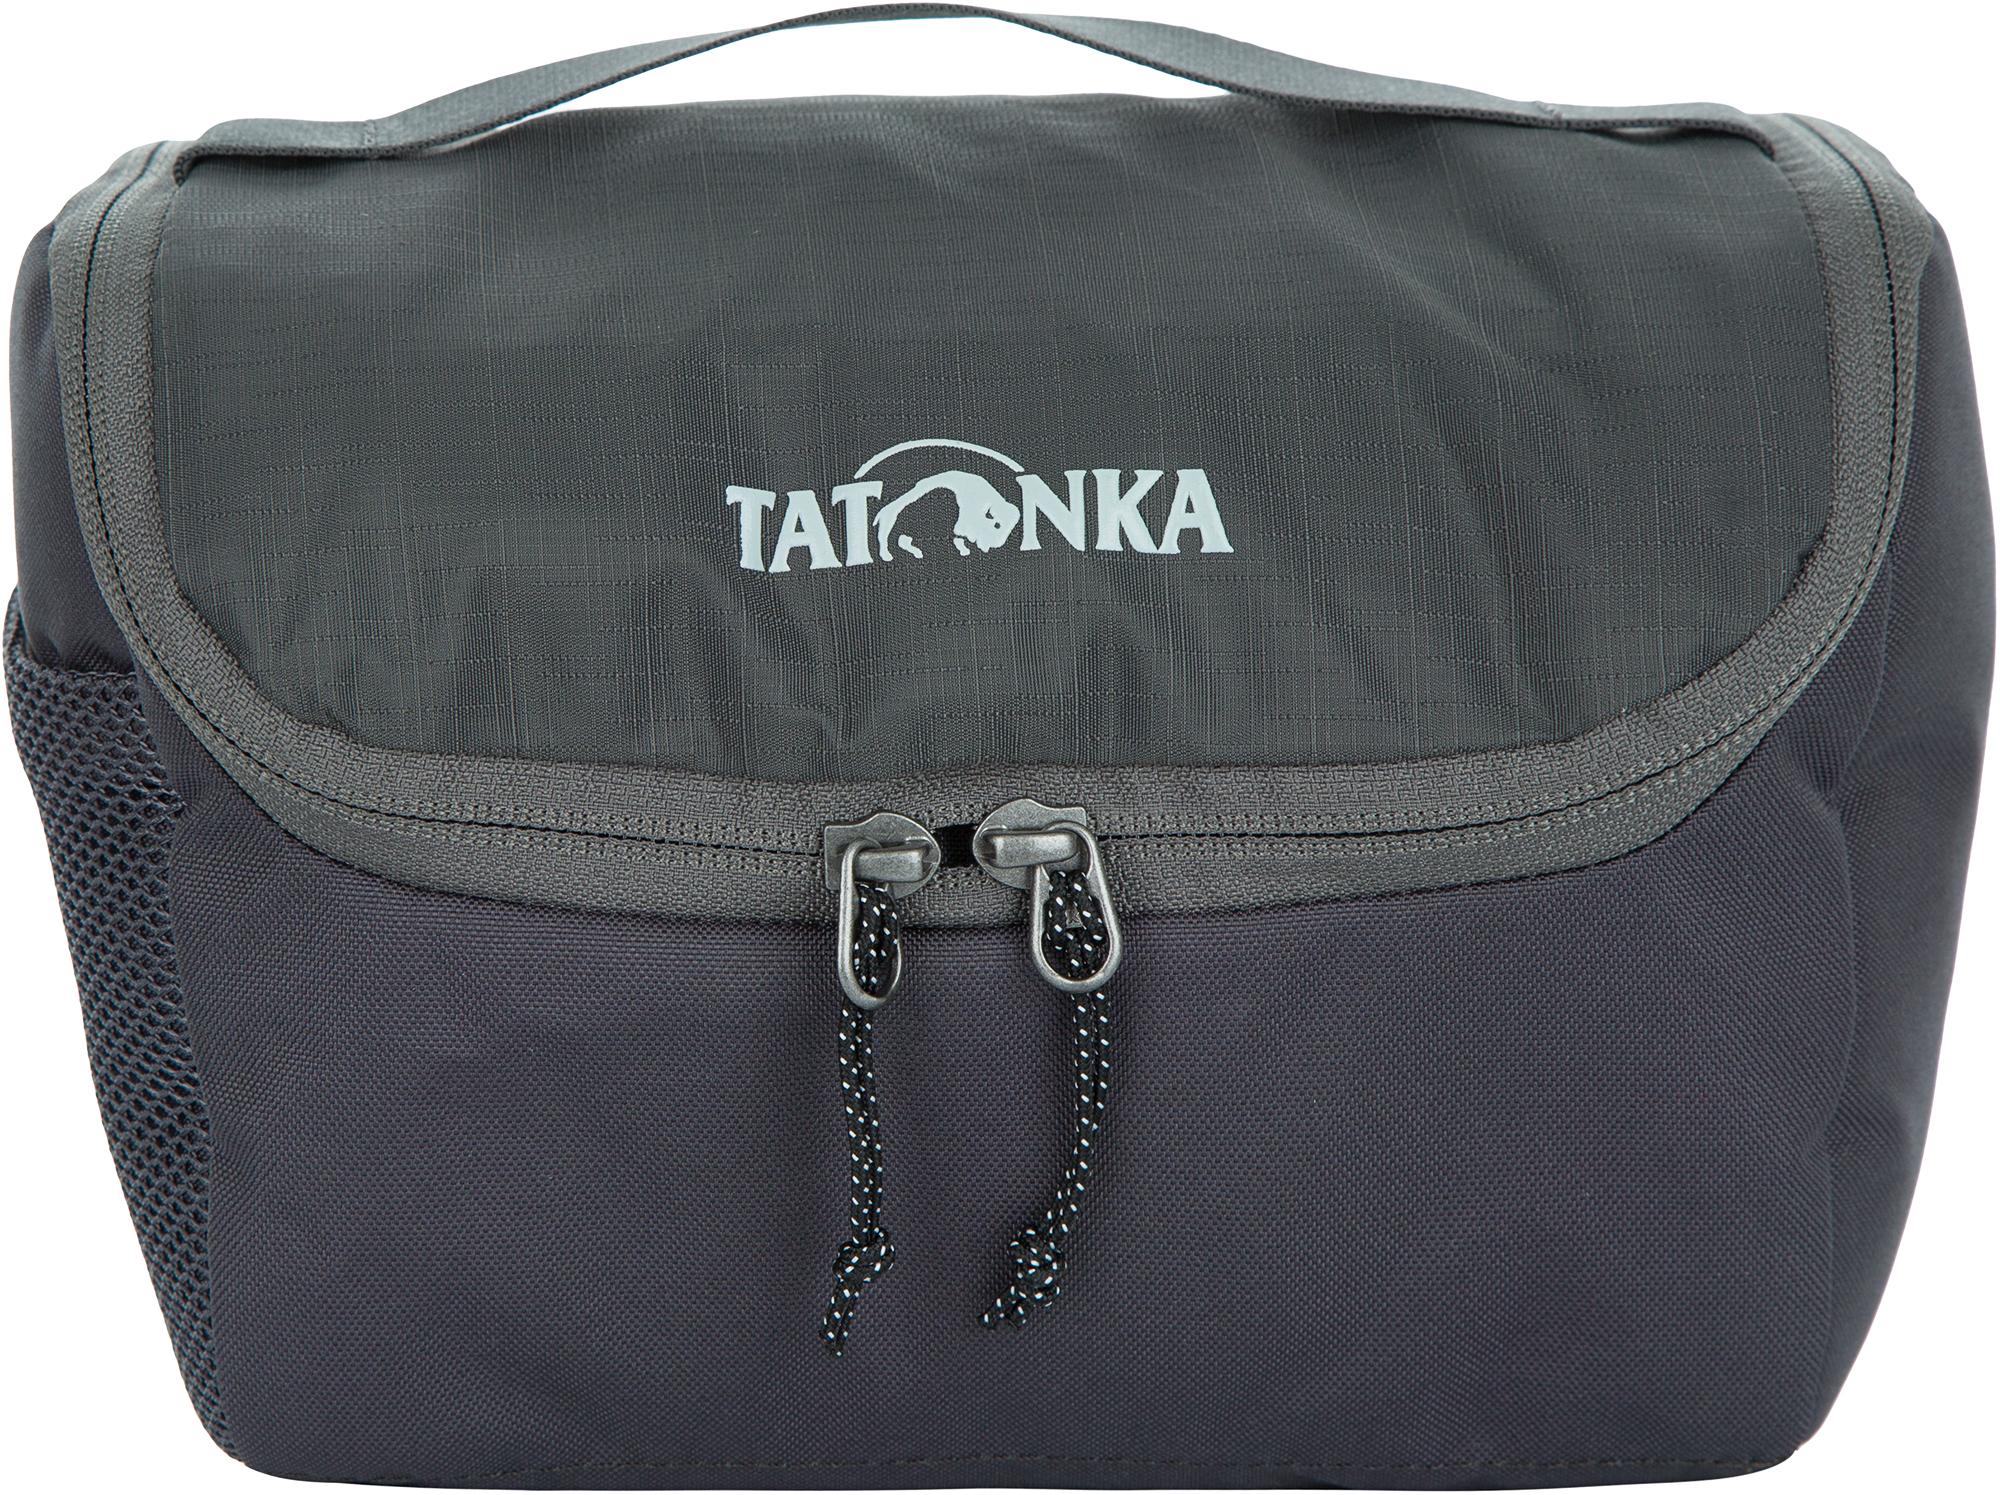 Tatonka Несессер Tatonka ONE WEEK цена 2017